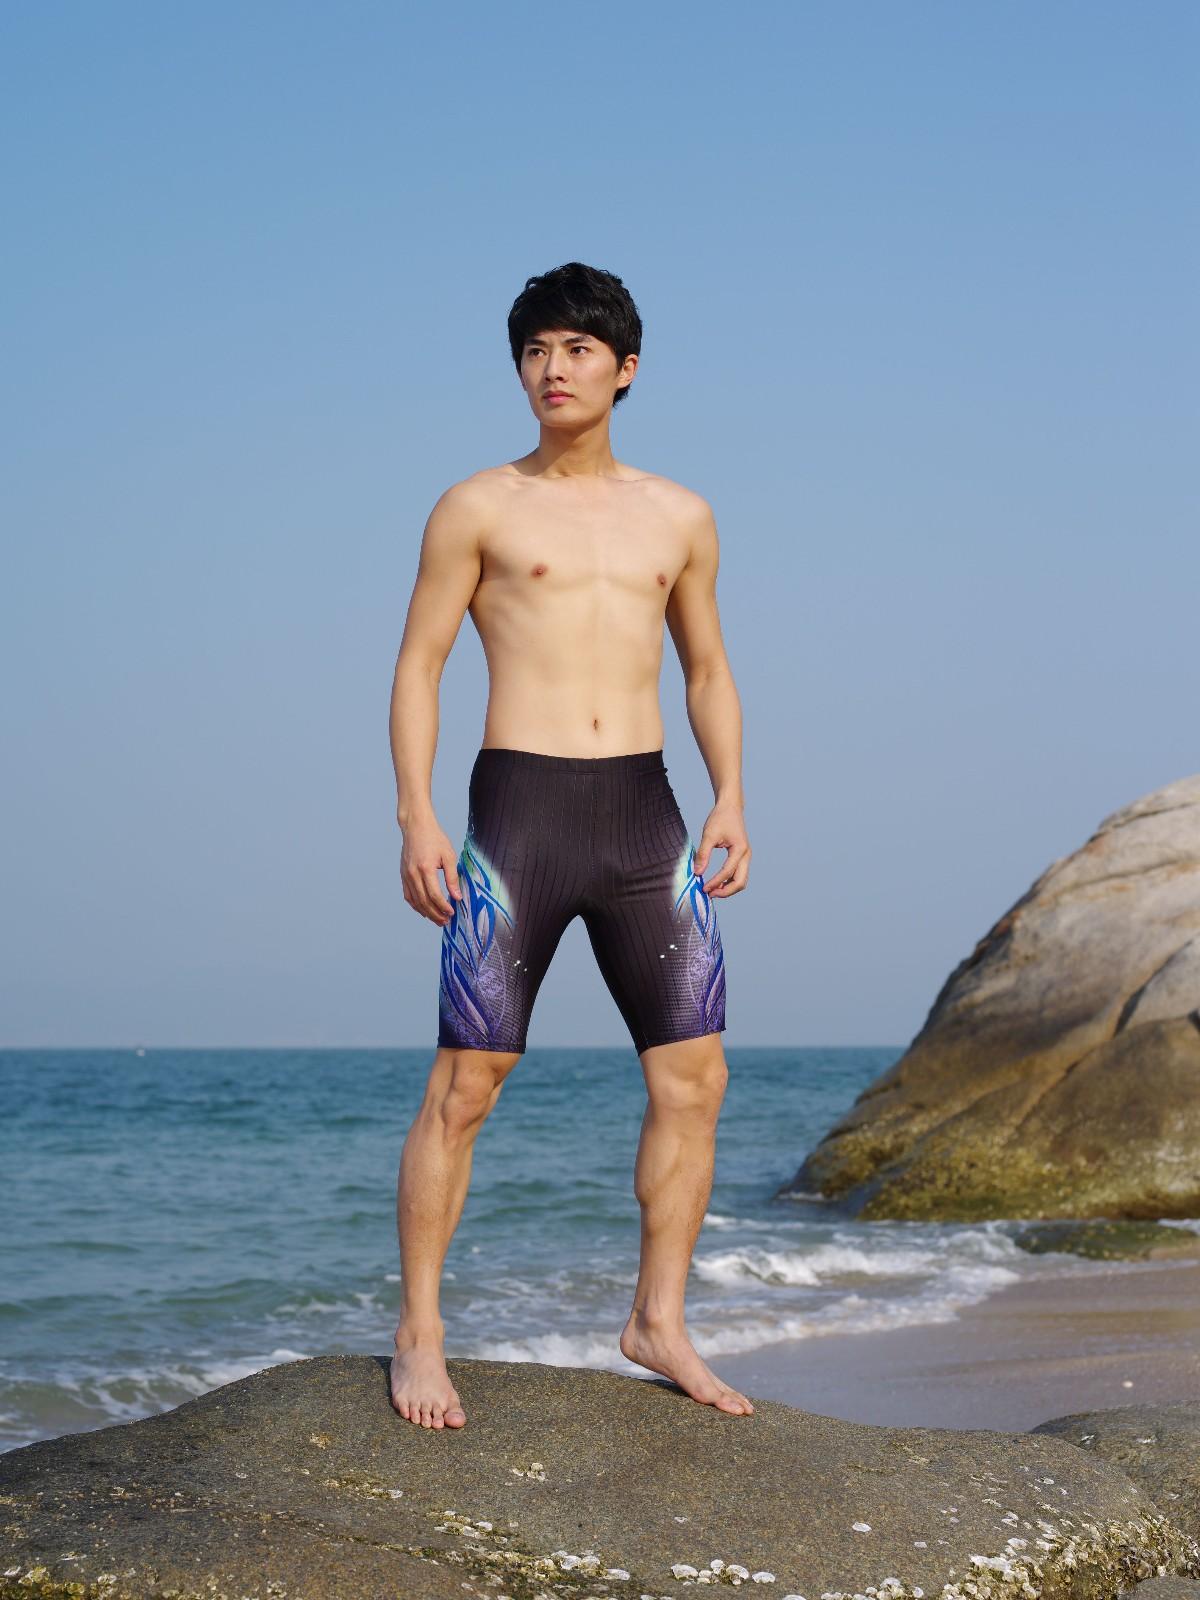 large size men's swim trunks Manufacturers, large size men's swim trunks Factory, Supply large size men's swim trunks